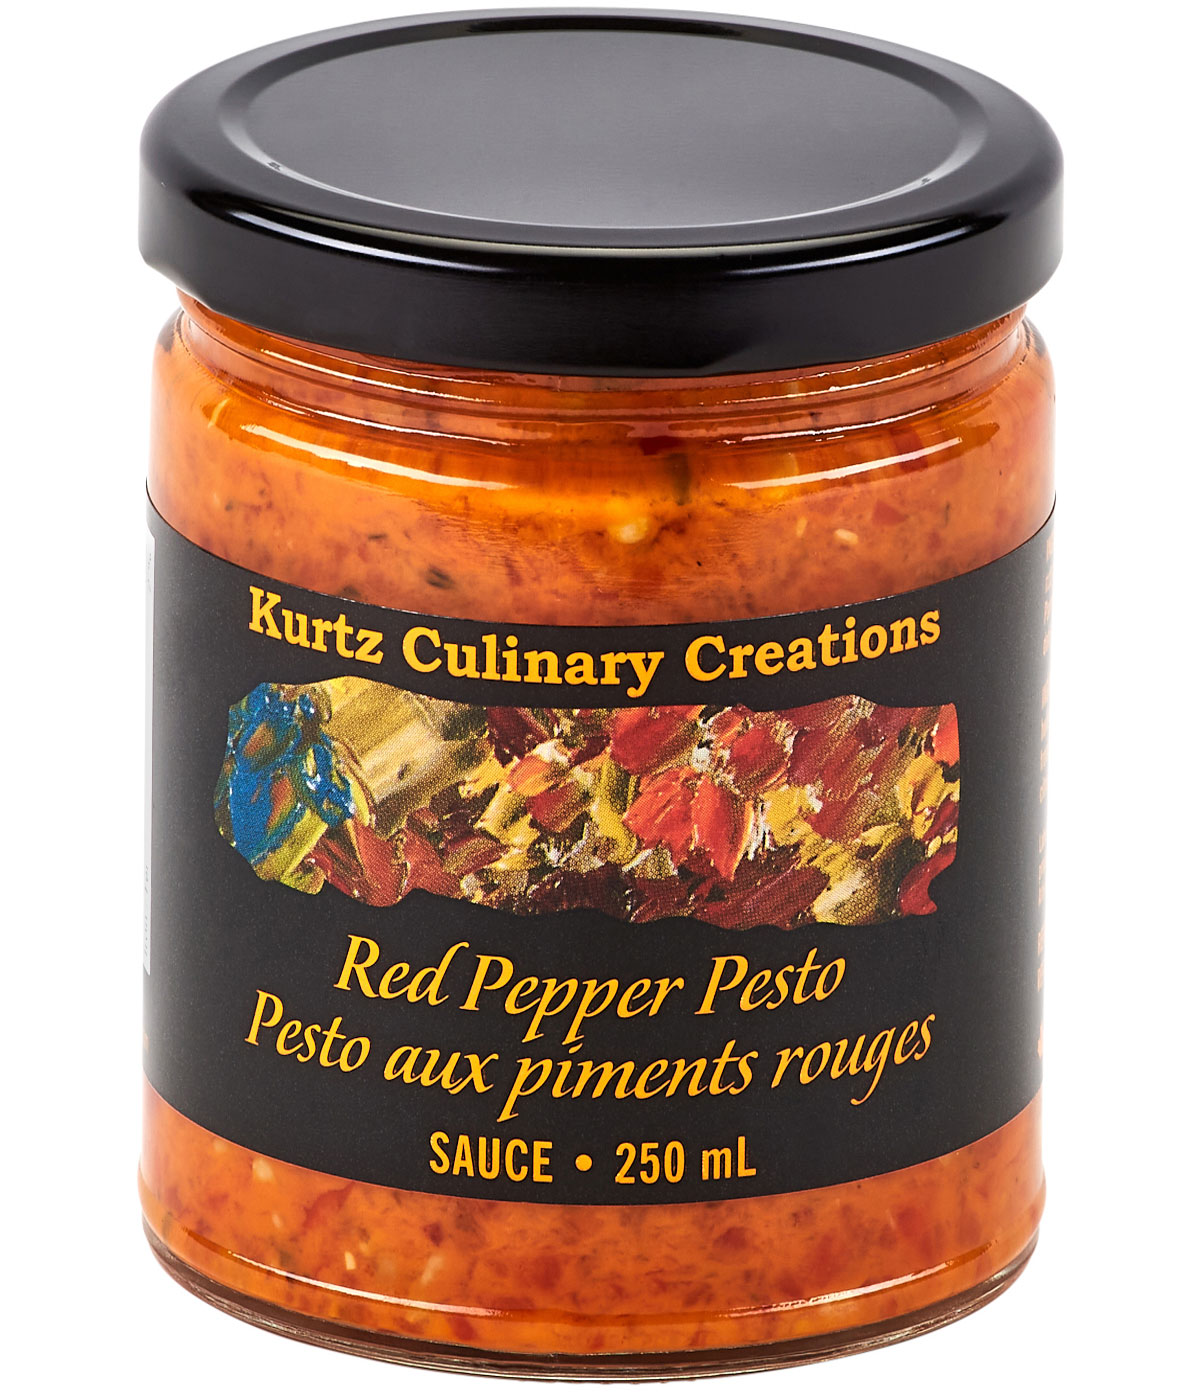 Red Pepper Pesto